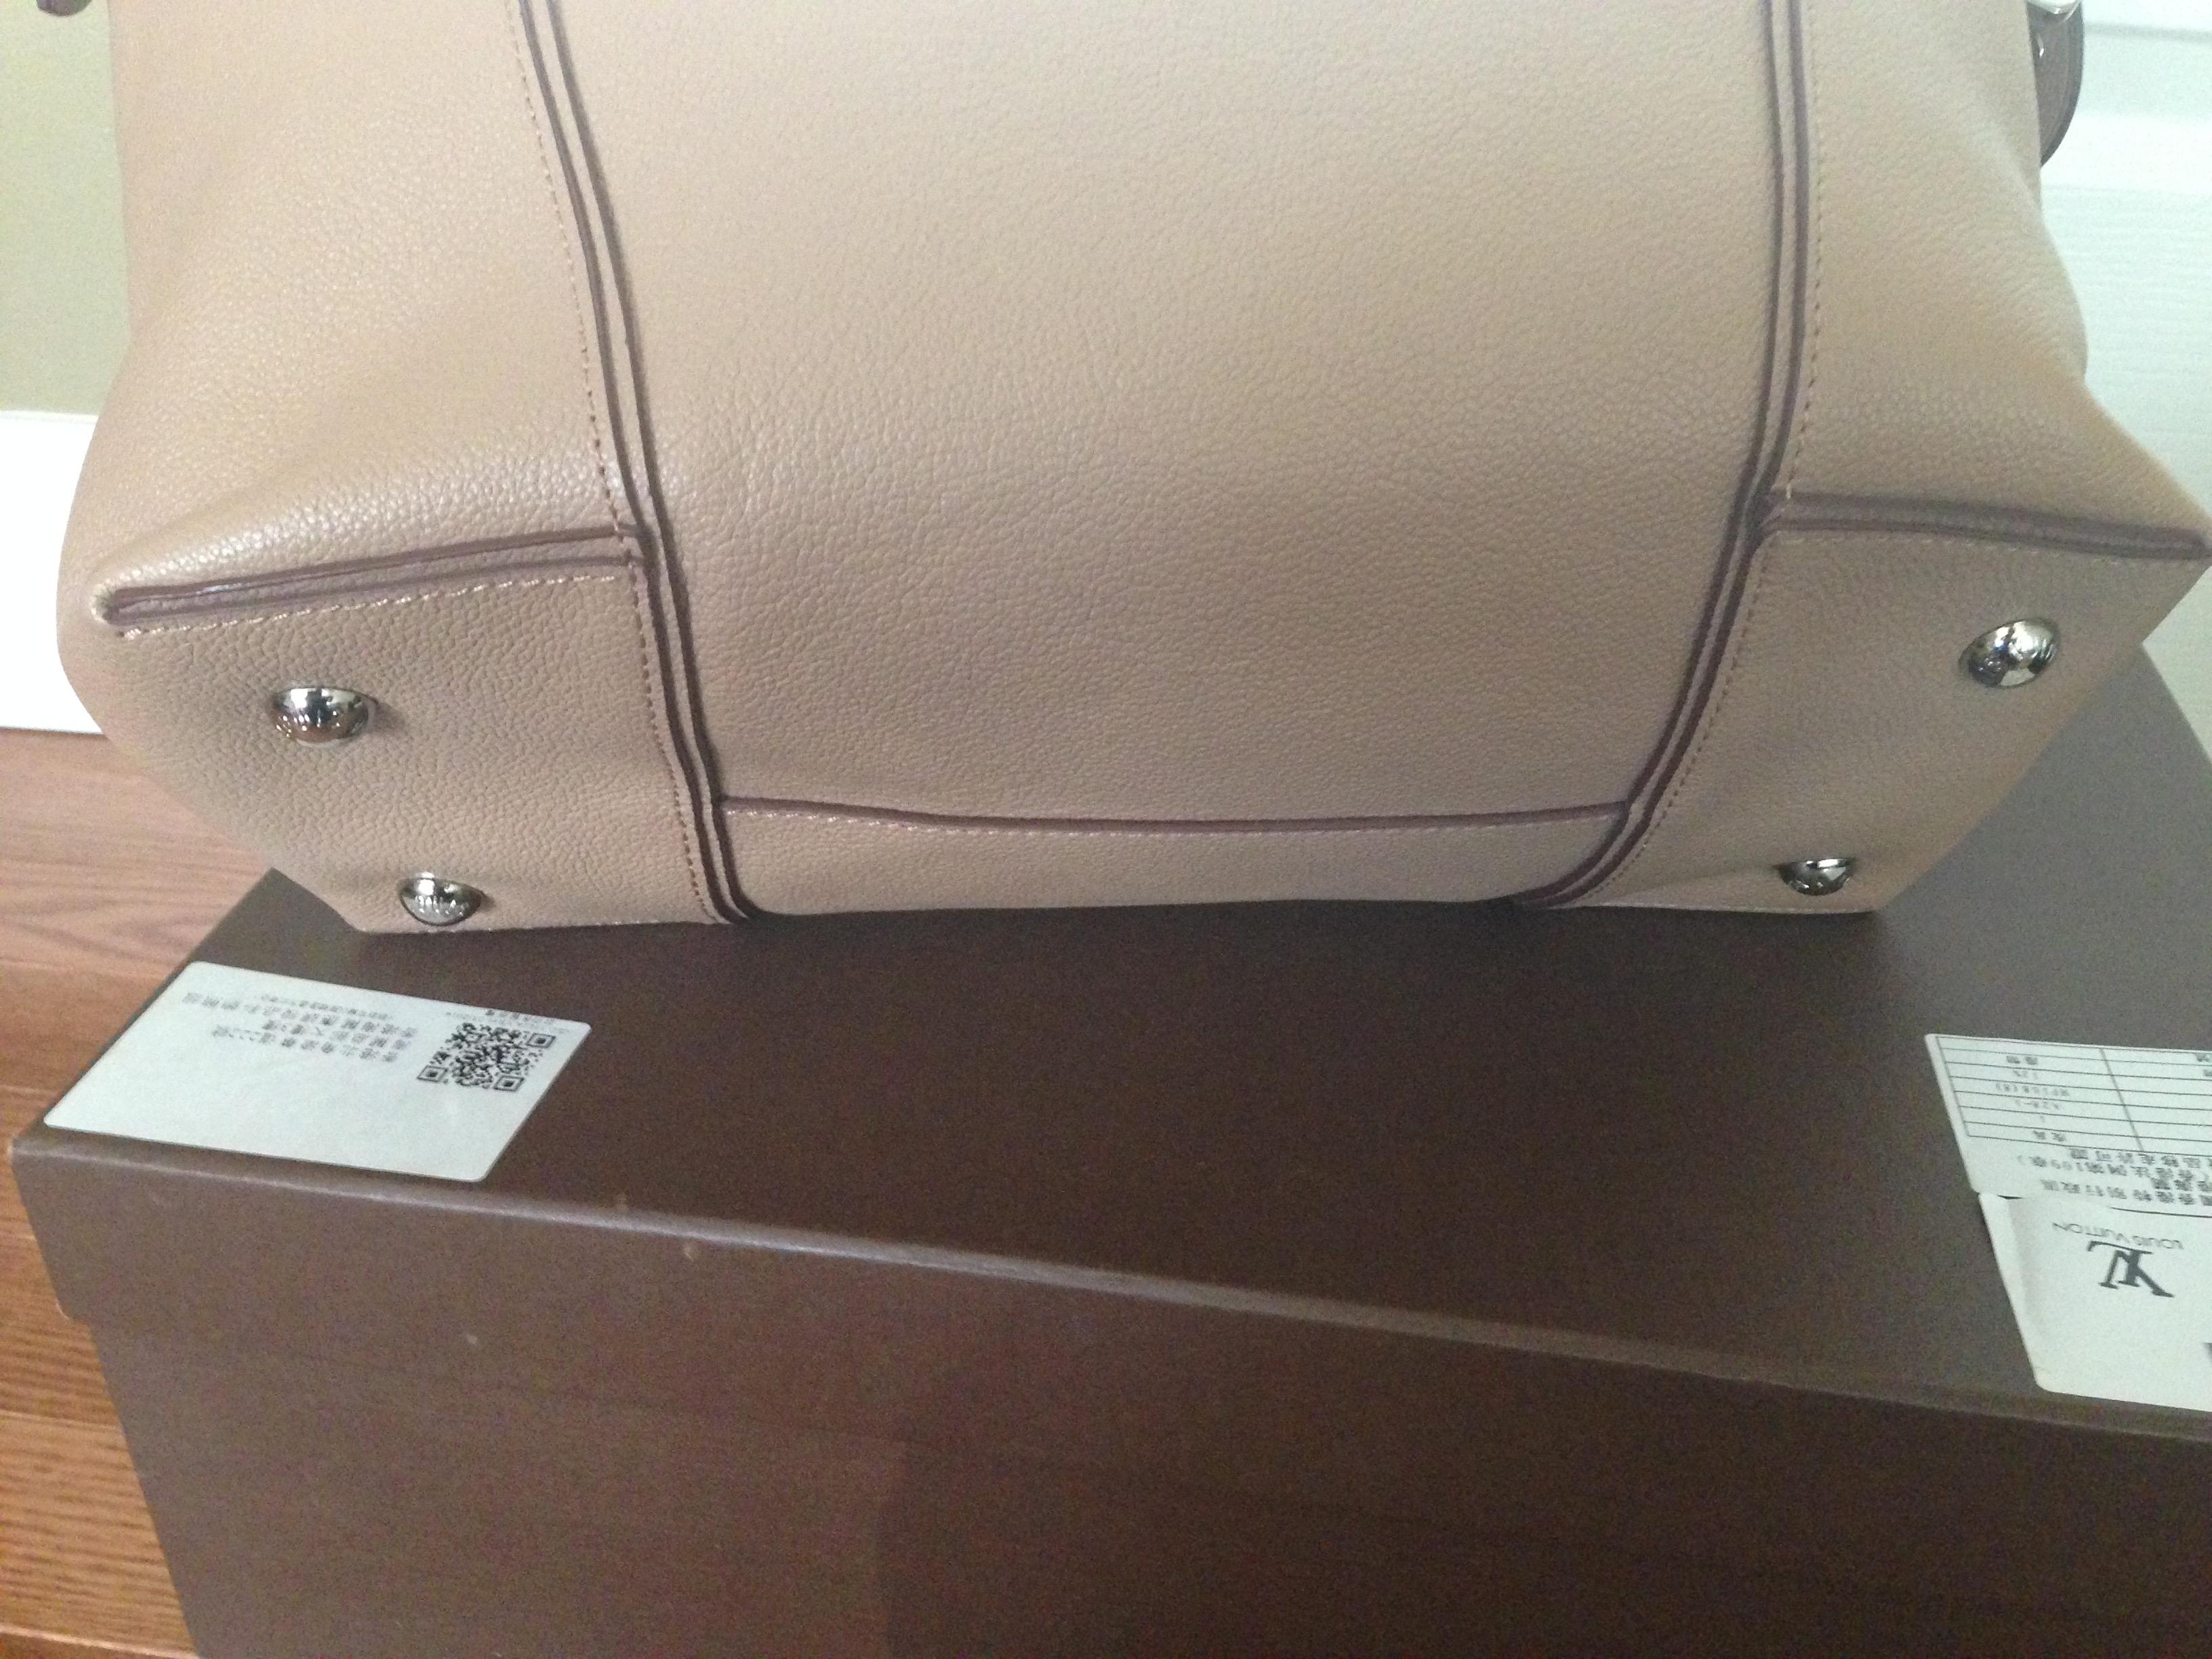 cuir handbags - Louis Vuitton �C Authentic & Replica Bags & Replica Handbags ...